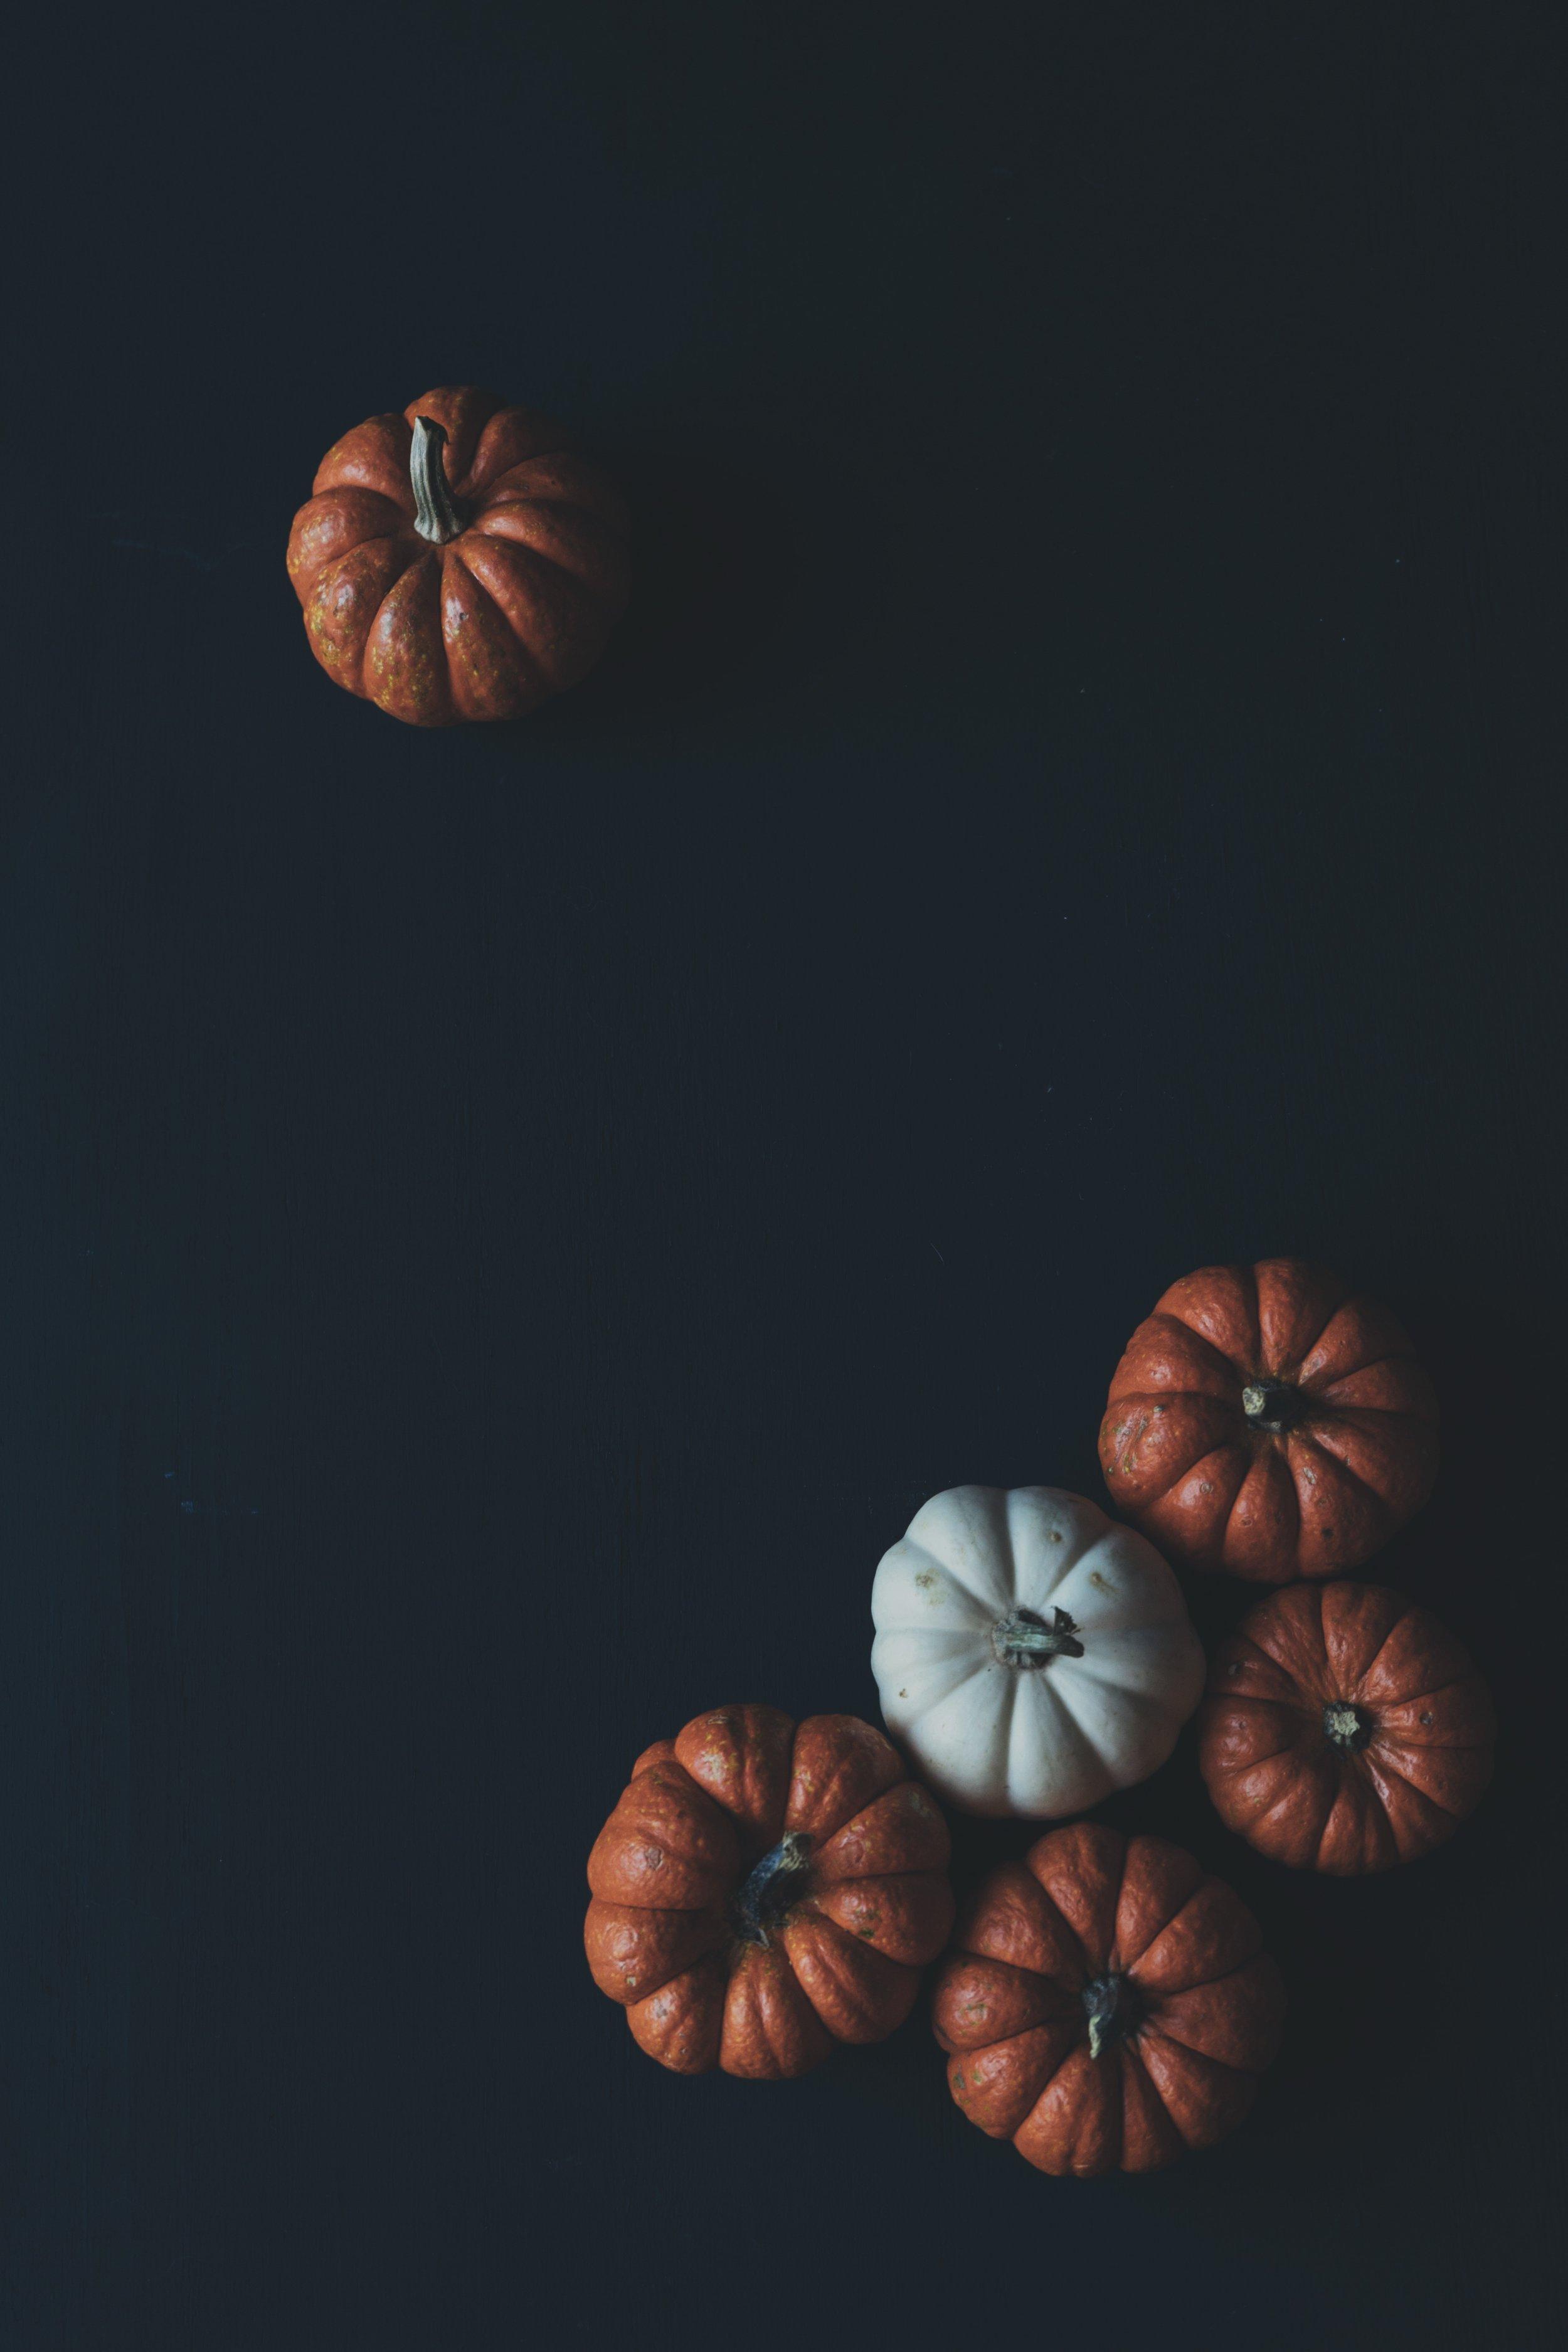 PumpkinSpice1.jpg